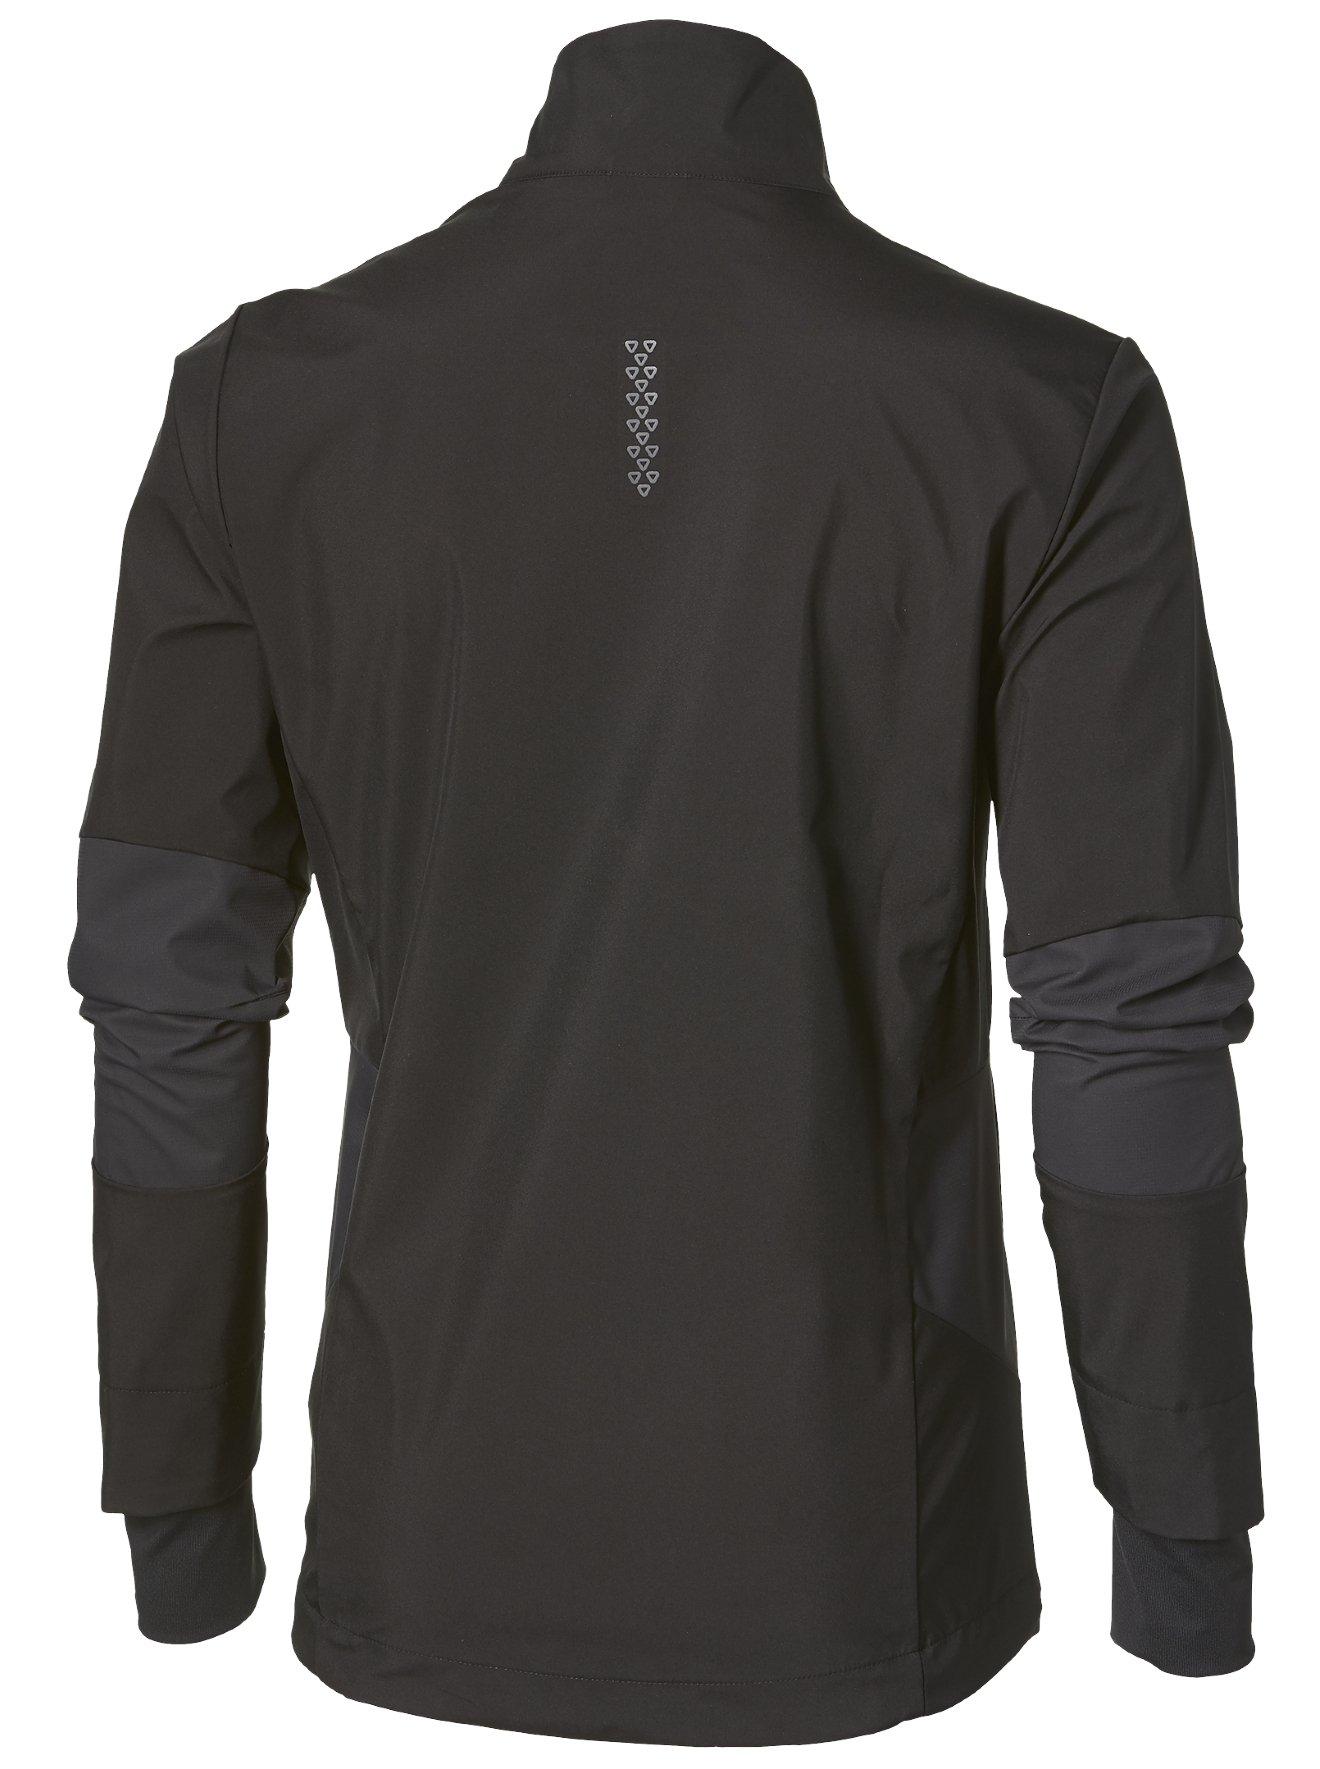 399b0a957c71 Купить женскую куртку Asics Windstopper Jacket W 134609 0904 ...